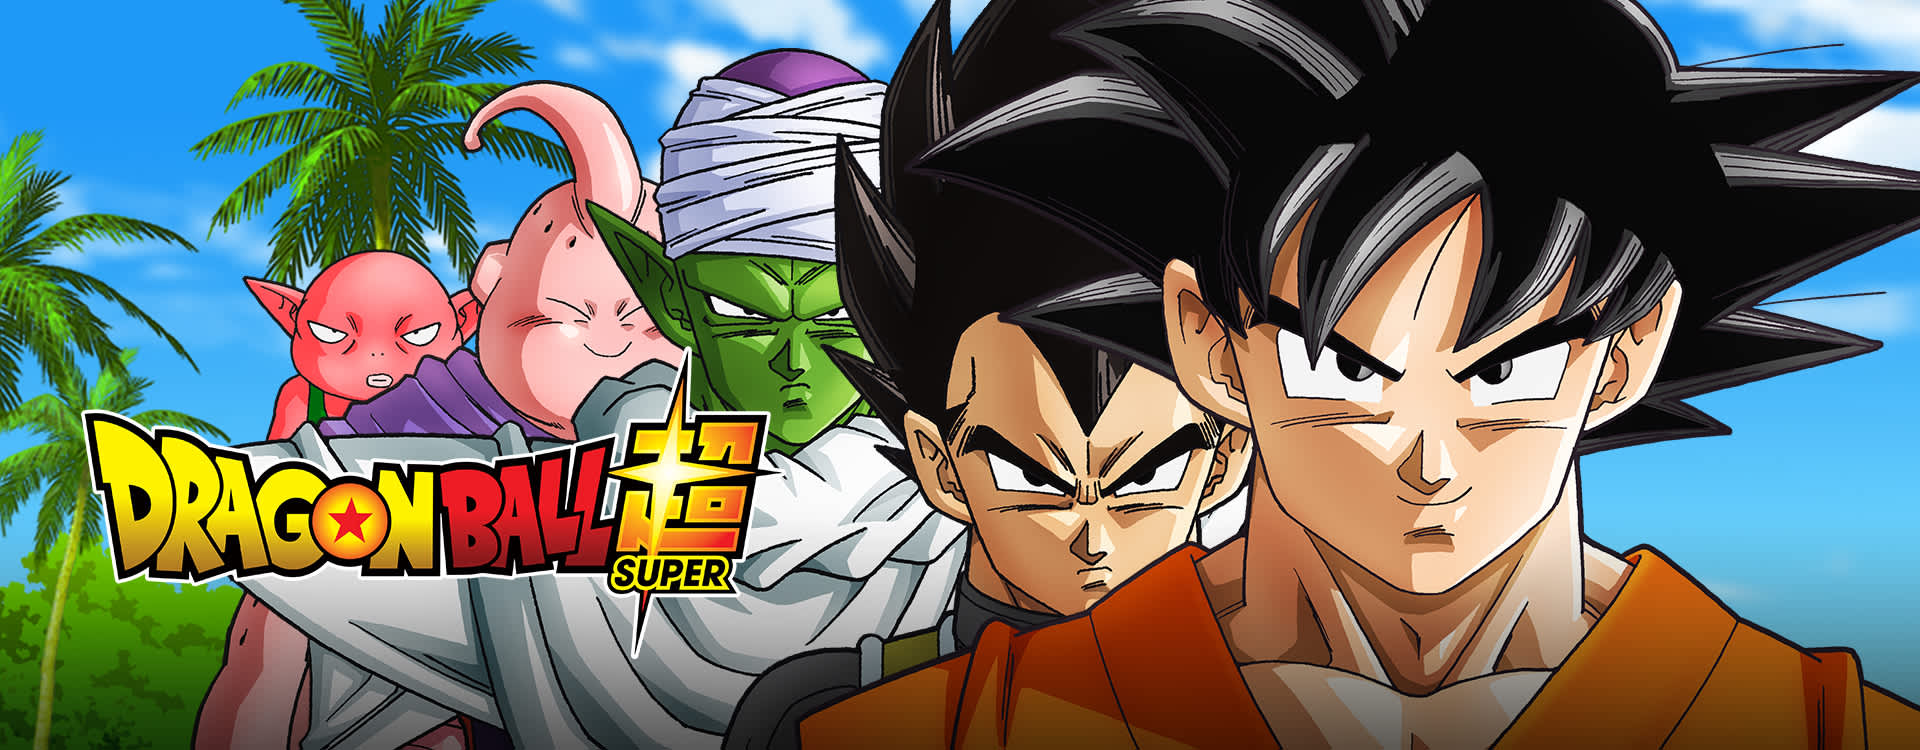 Watch Dragon Ball Super Episodes Sub & Dub | Action